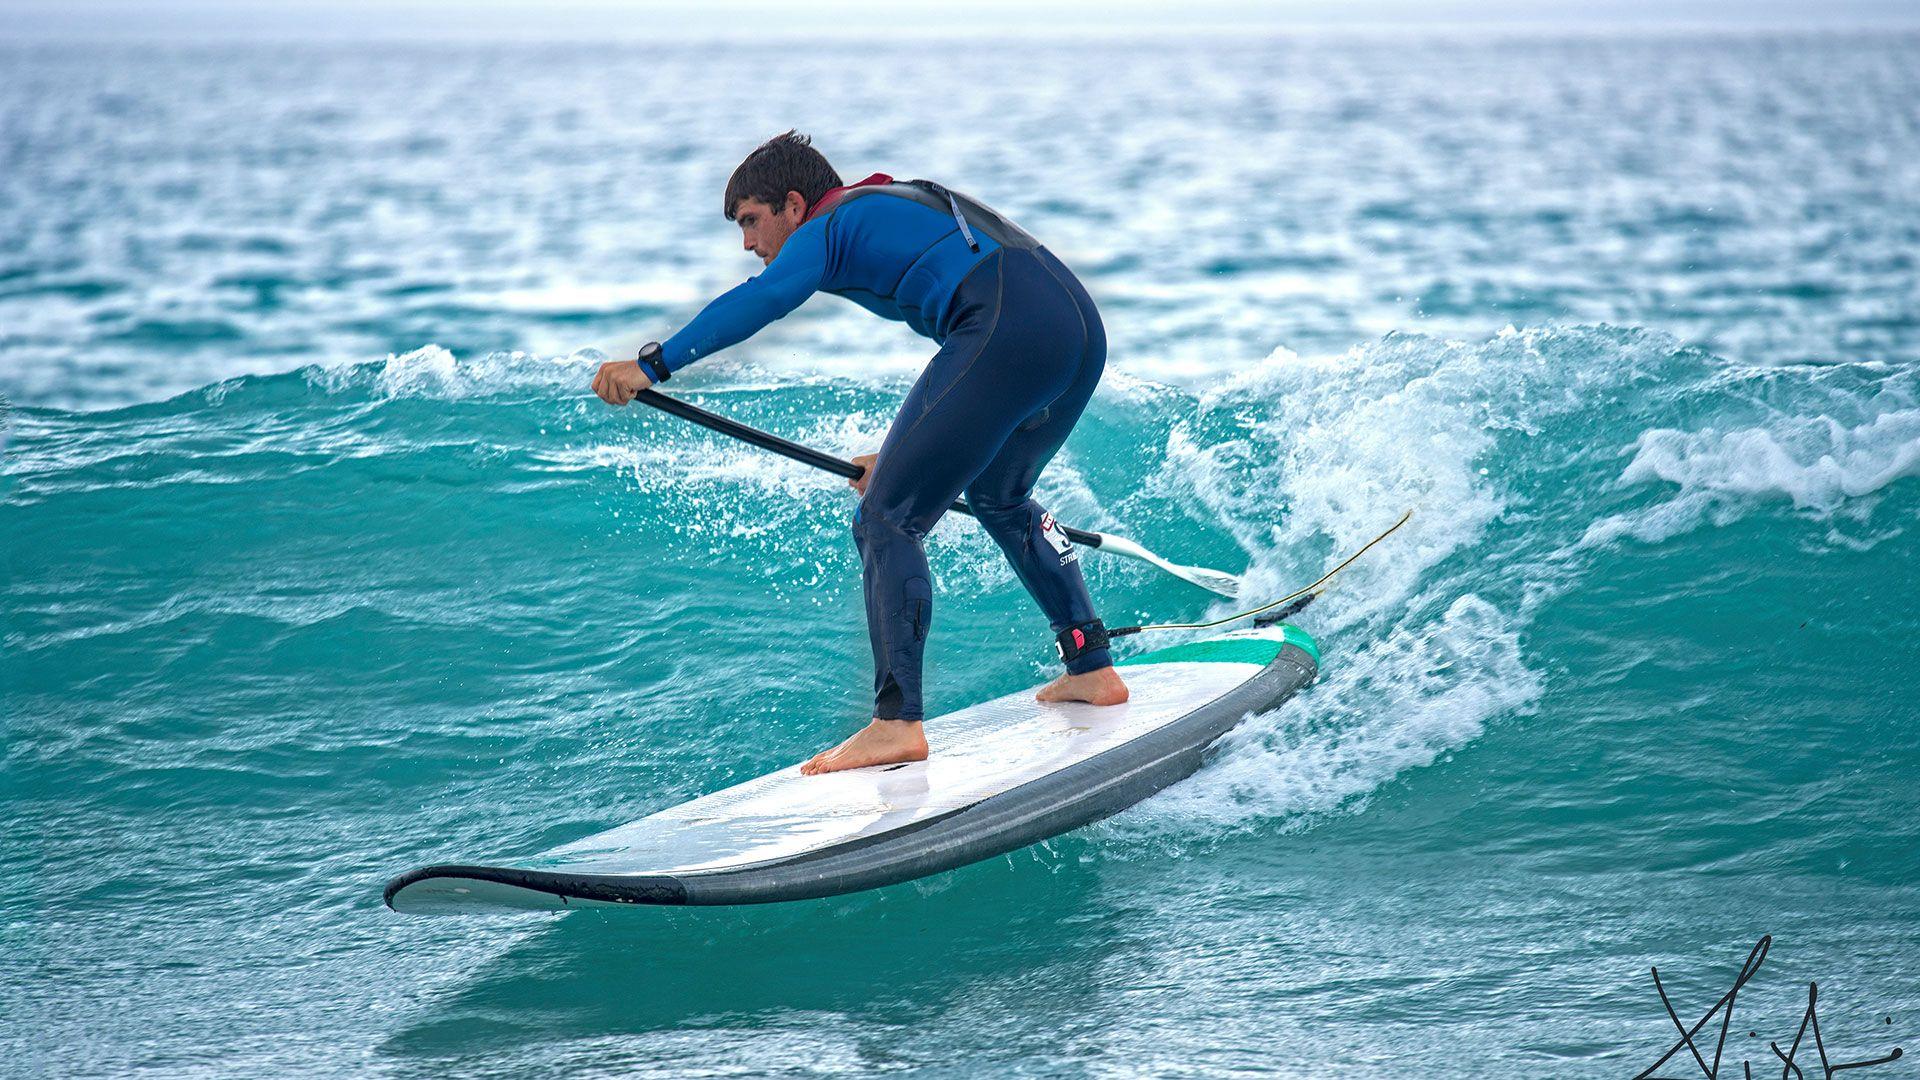 surf-board-wave-windsurfersworld-windsurfing-ixia